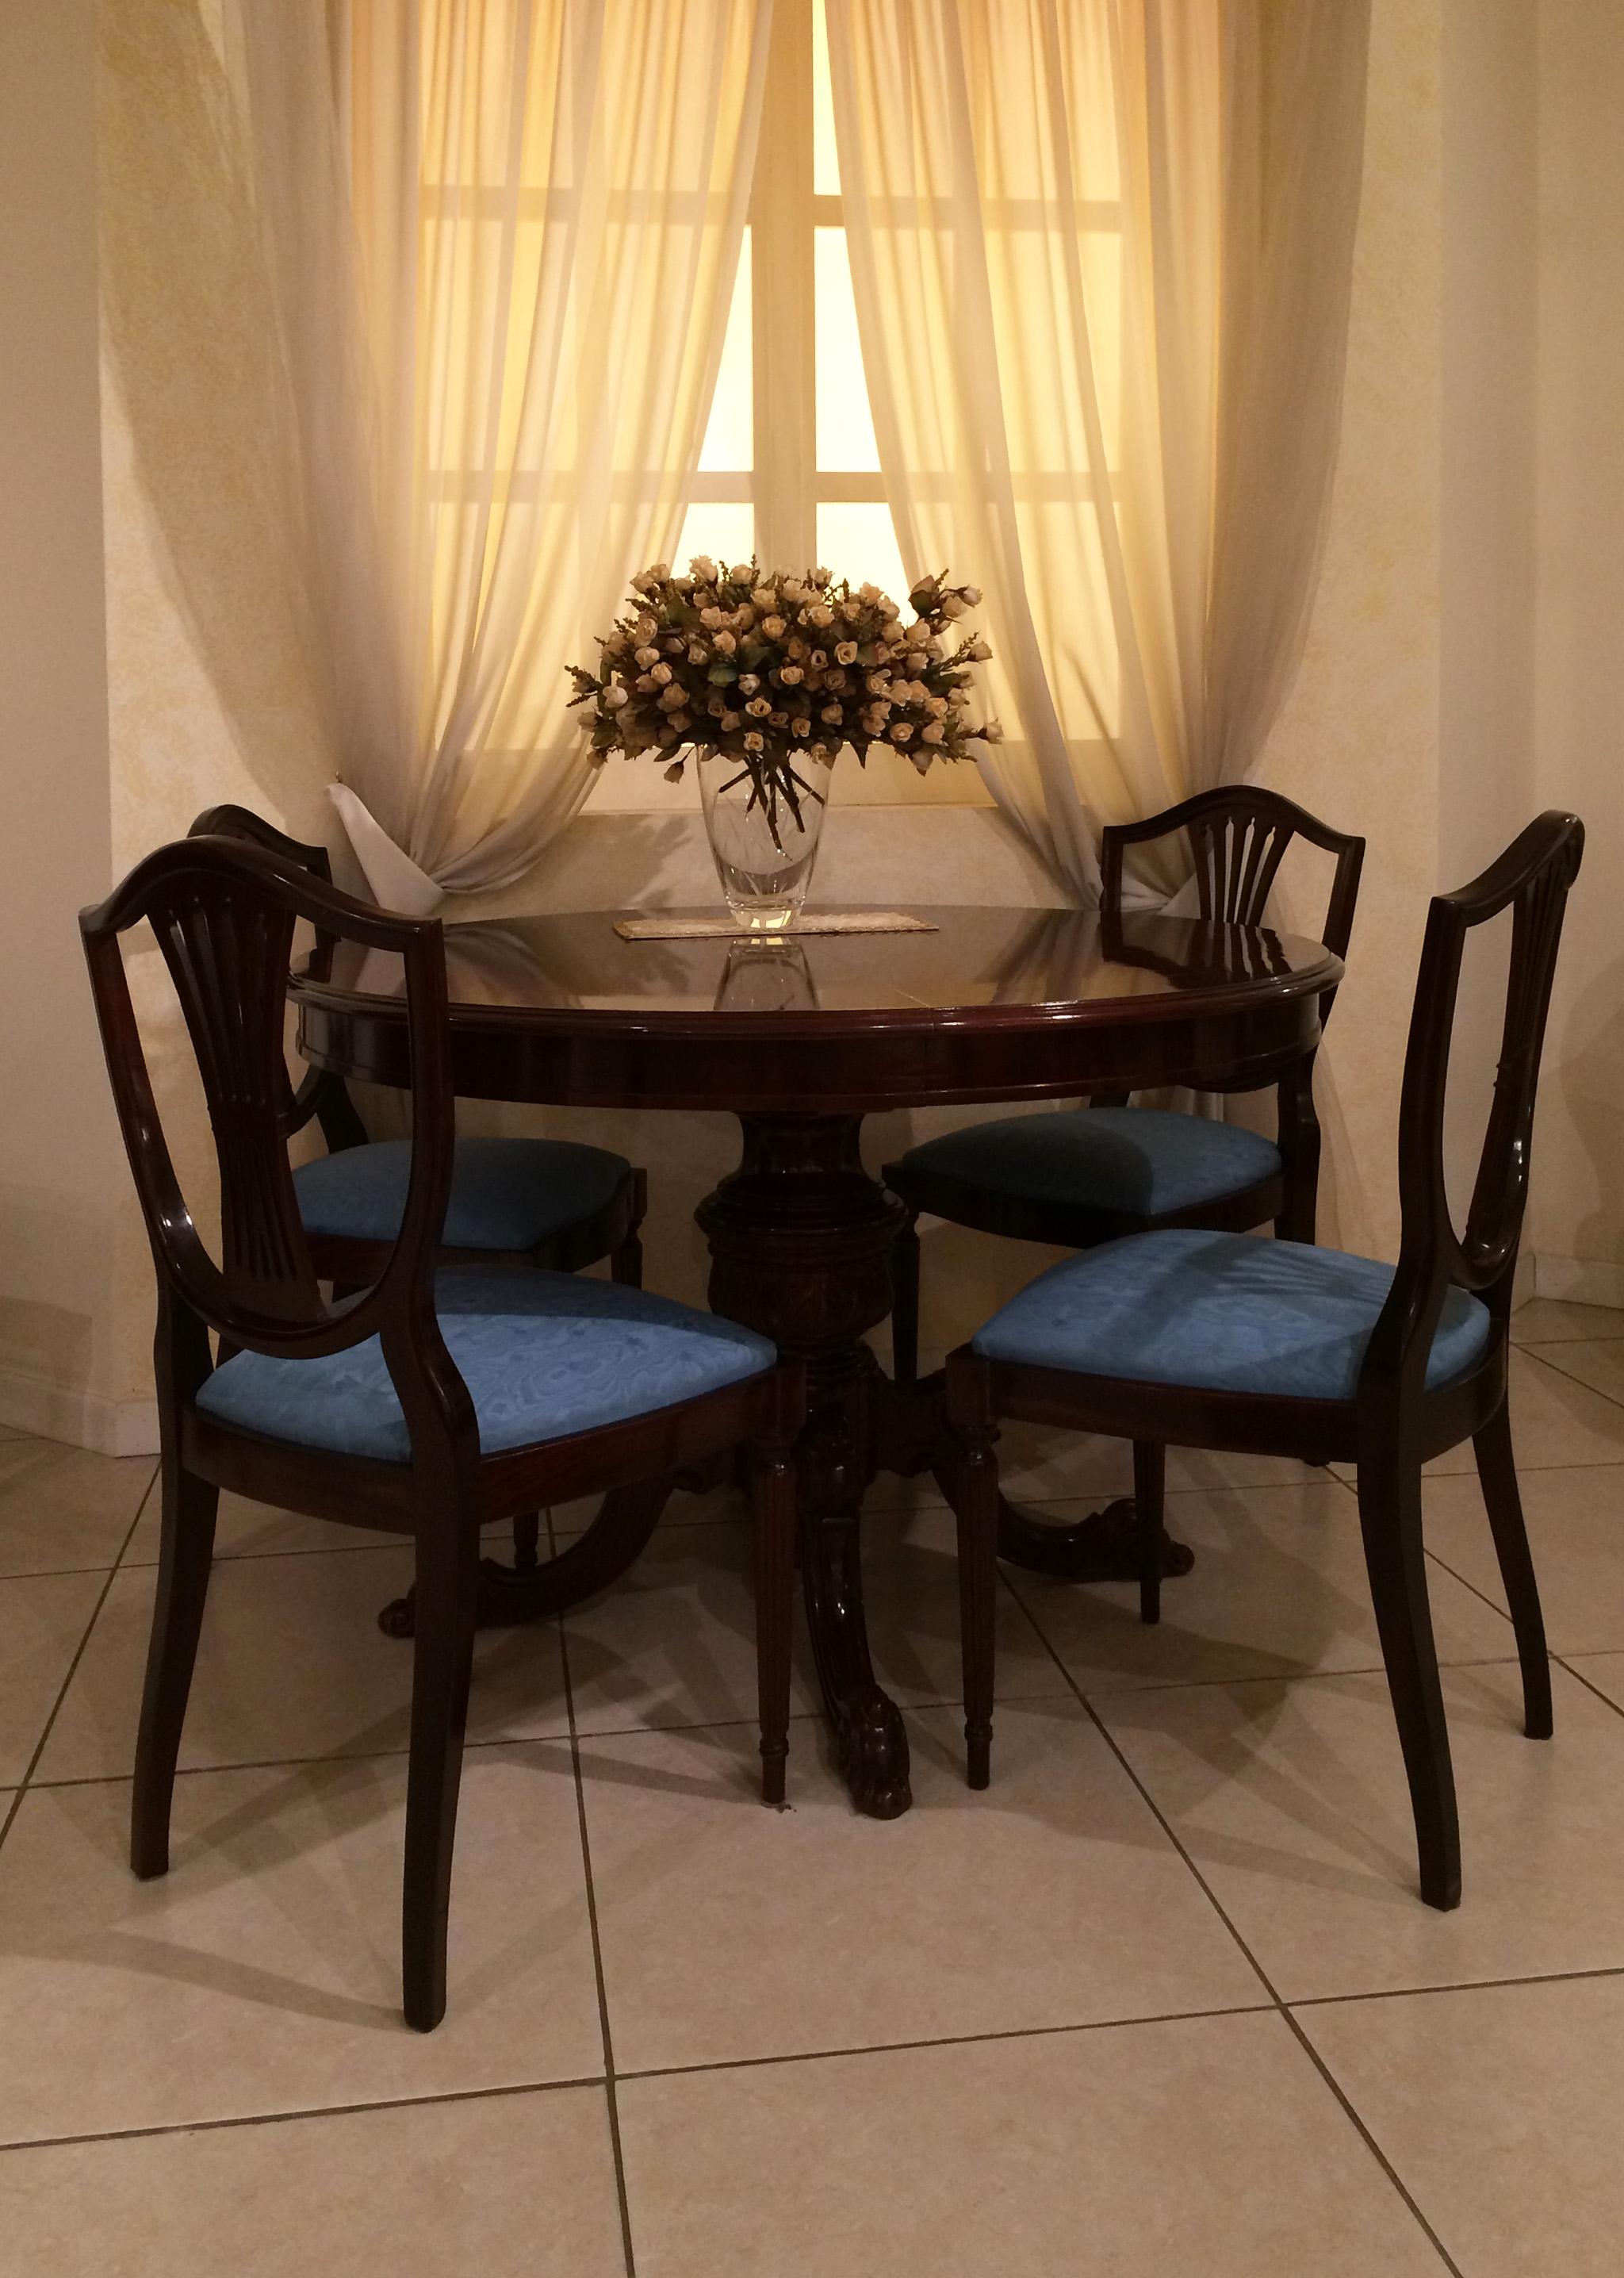 sala da pranzo Inglese - Offerte Sale da pranzo | Esposizione ...